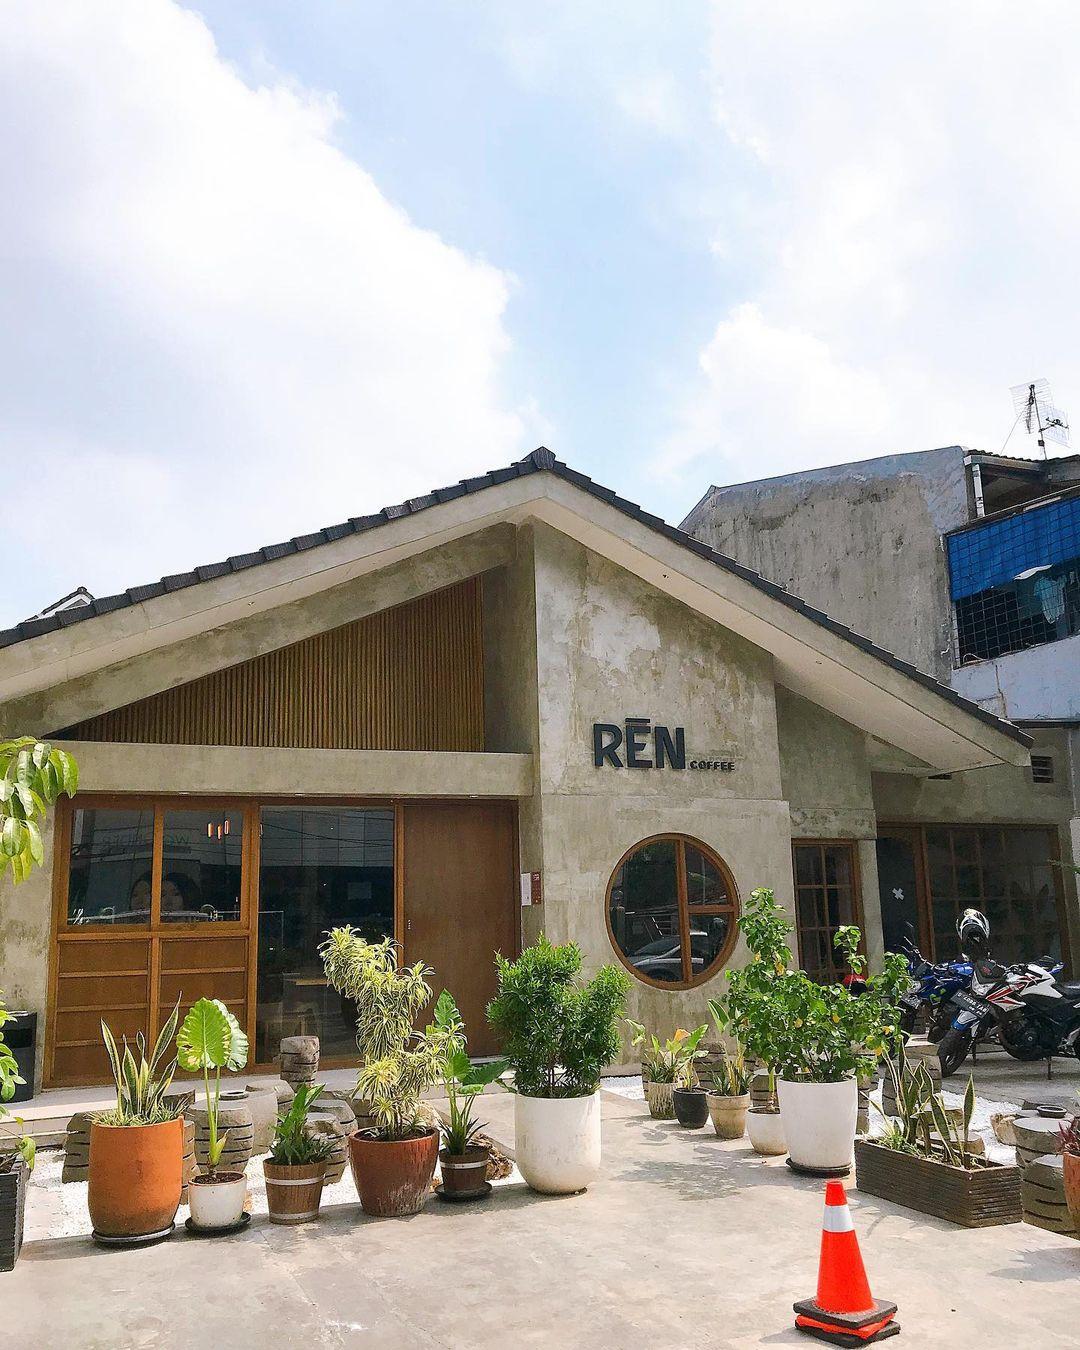 Bagian Depan Ren Coffee Tebet Image From @_yudistira